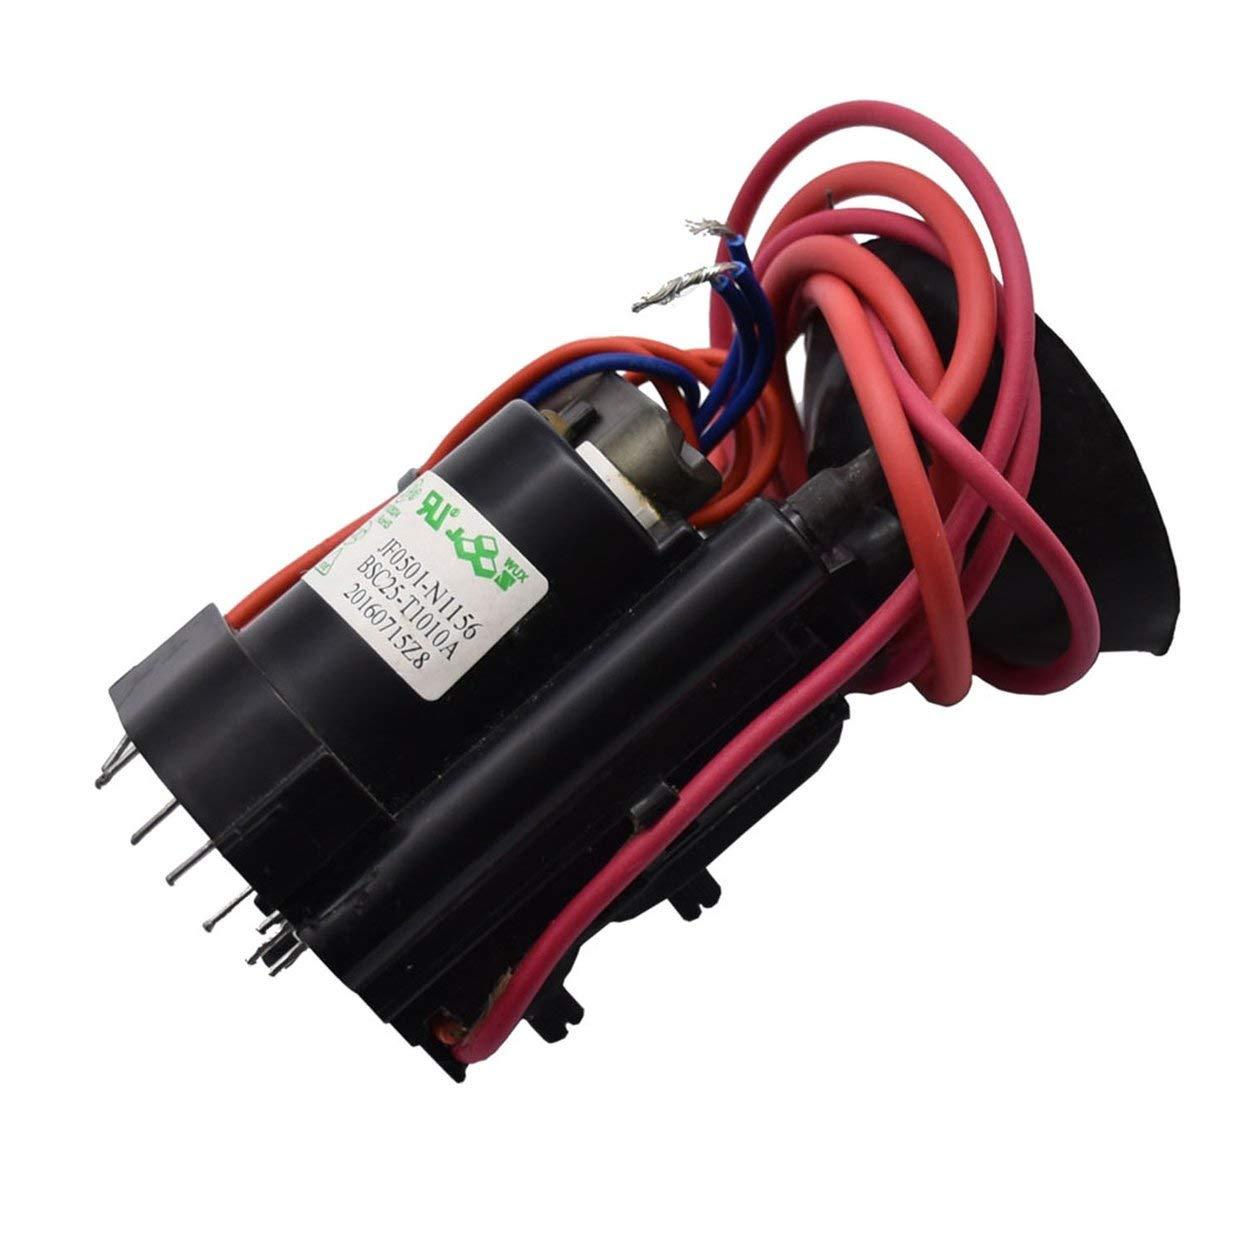 Nullspannungsschalt-Tesla-Spulen-Flyback-Treiber f/ür Sgtc//Marx-Generator//Jacob-Leiter Schwarz Z/ündspule